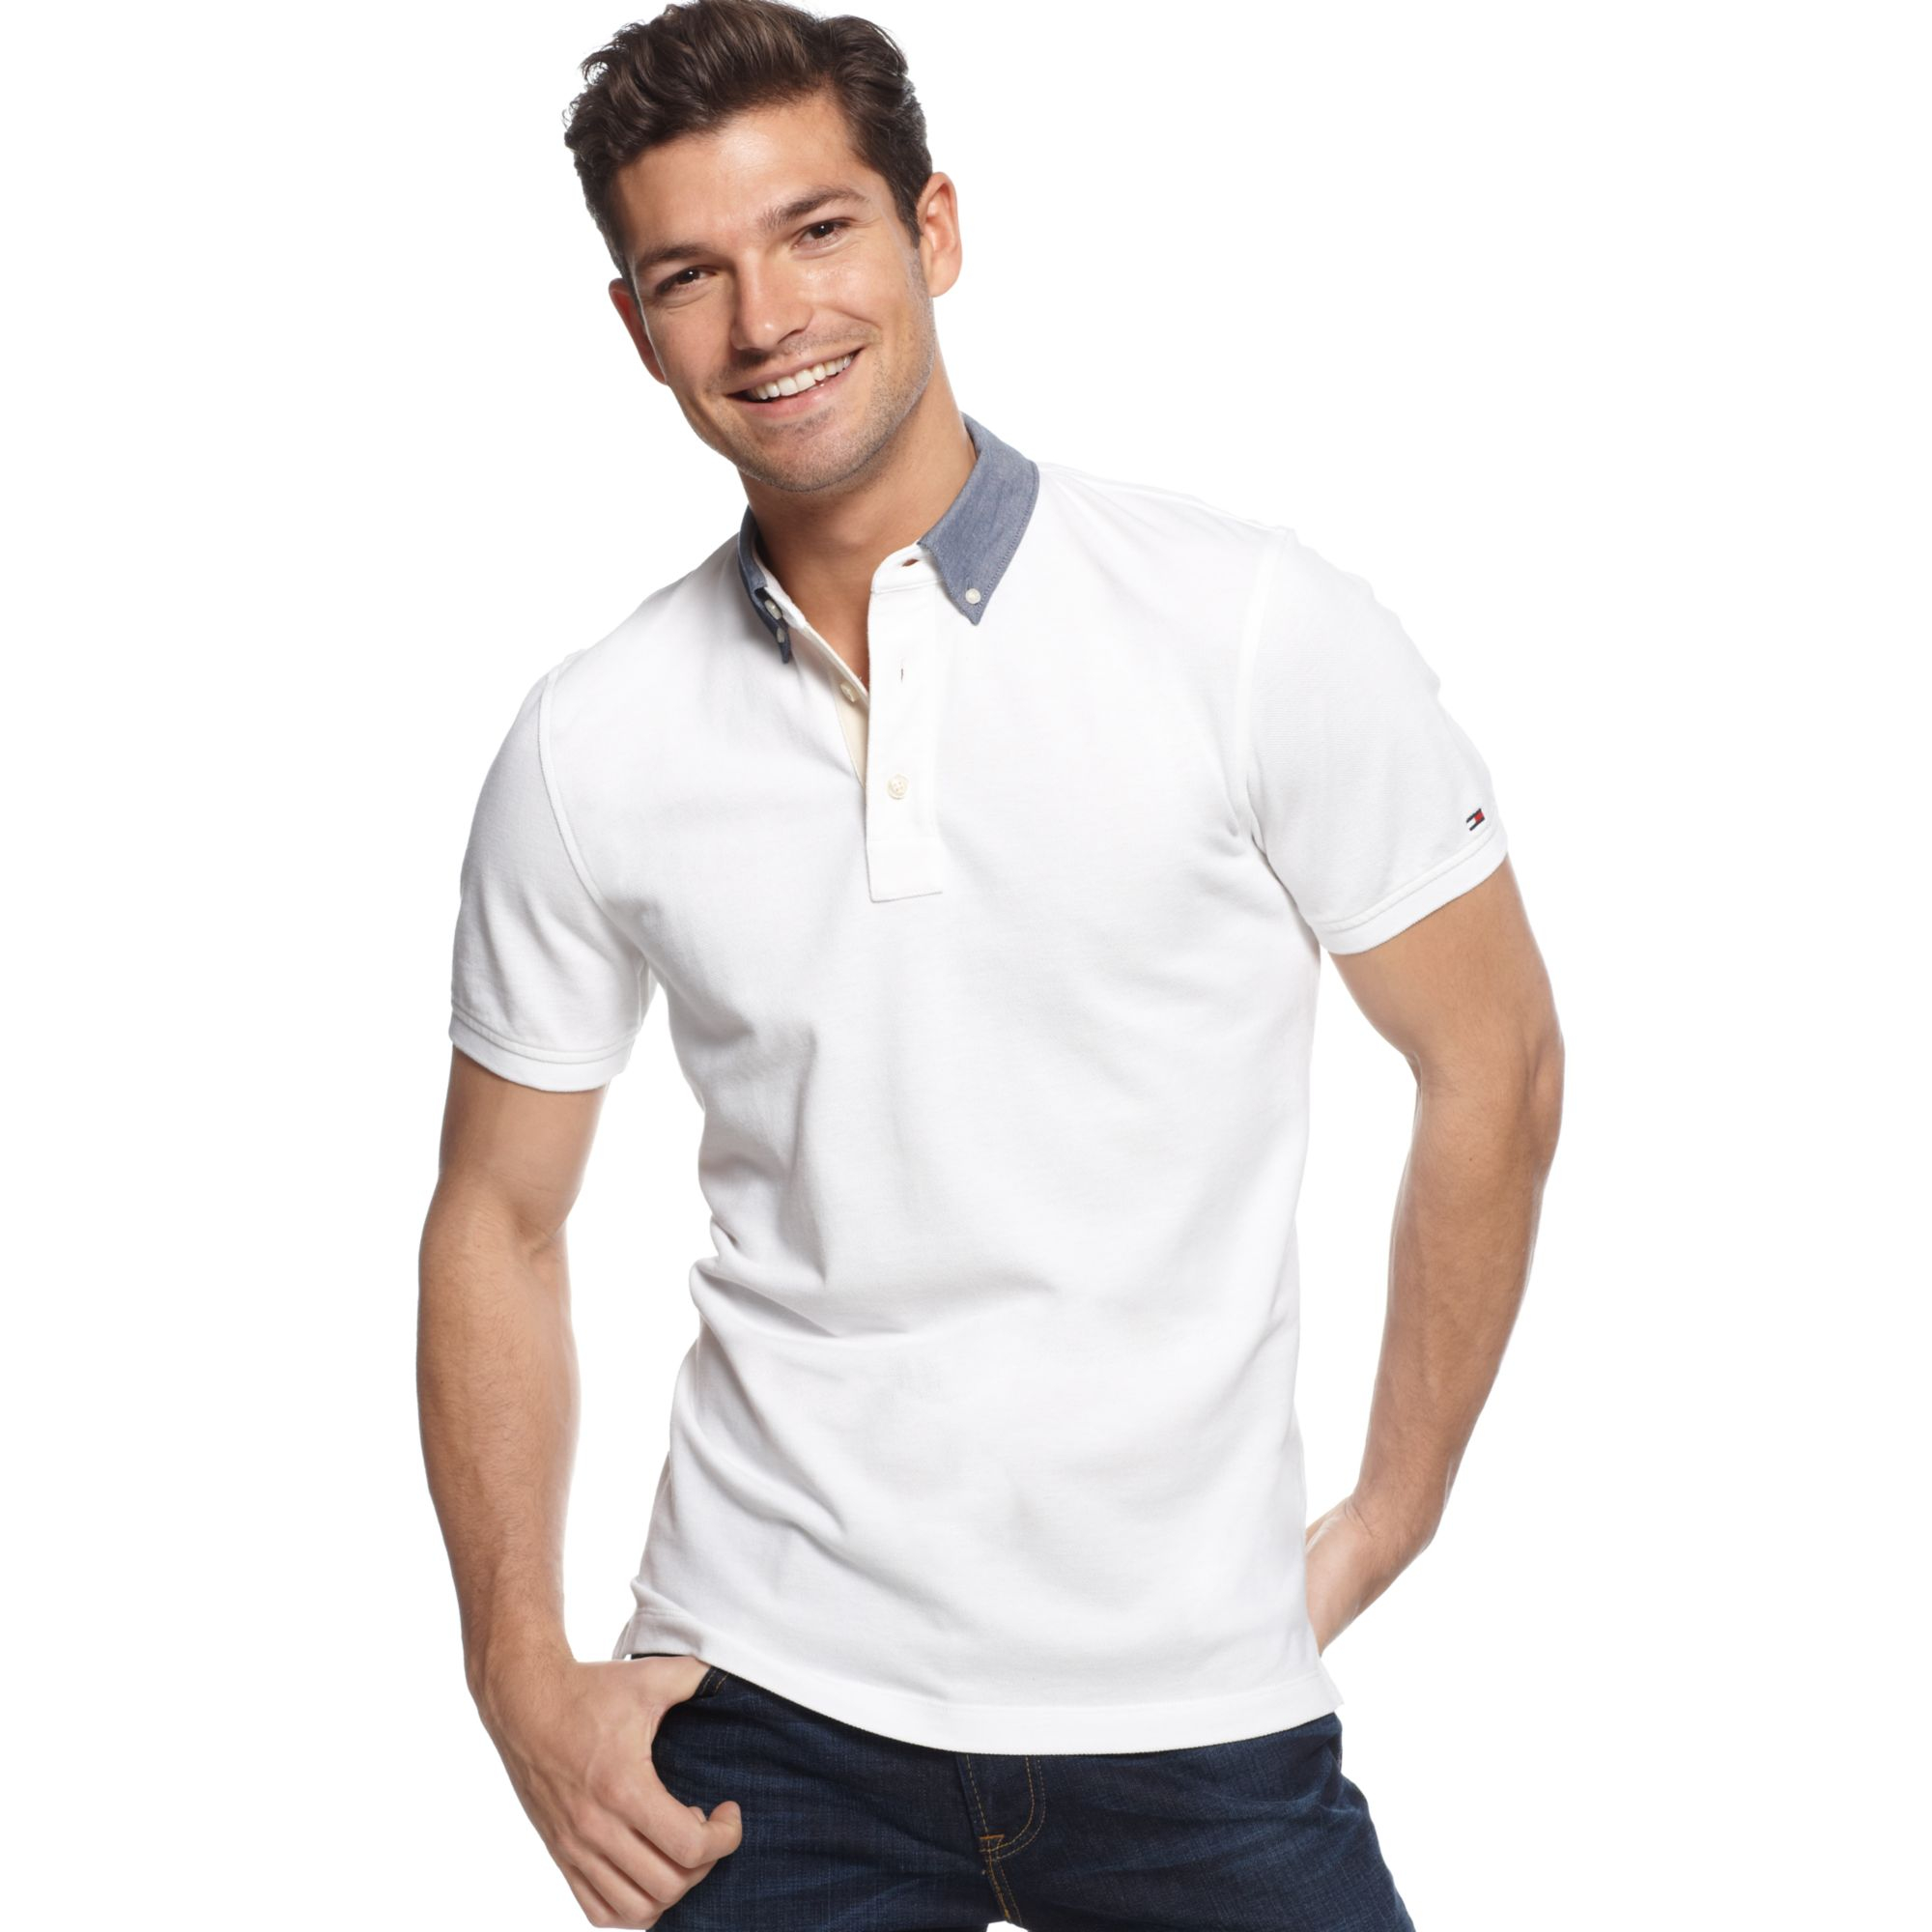 4f4e35c69a19b Tag Tommy Hilfiger Polo Shirt White — waldon.protese-de-silicone.info